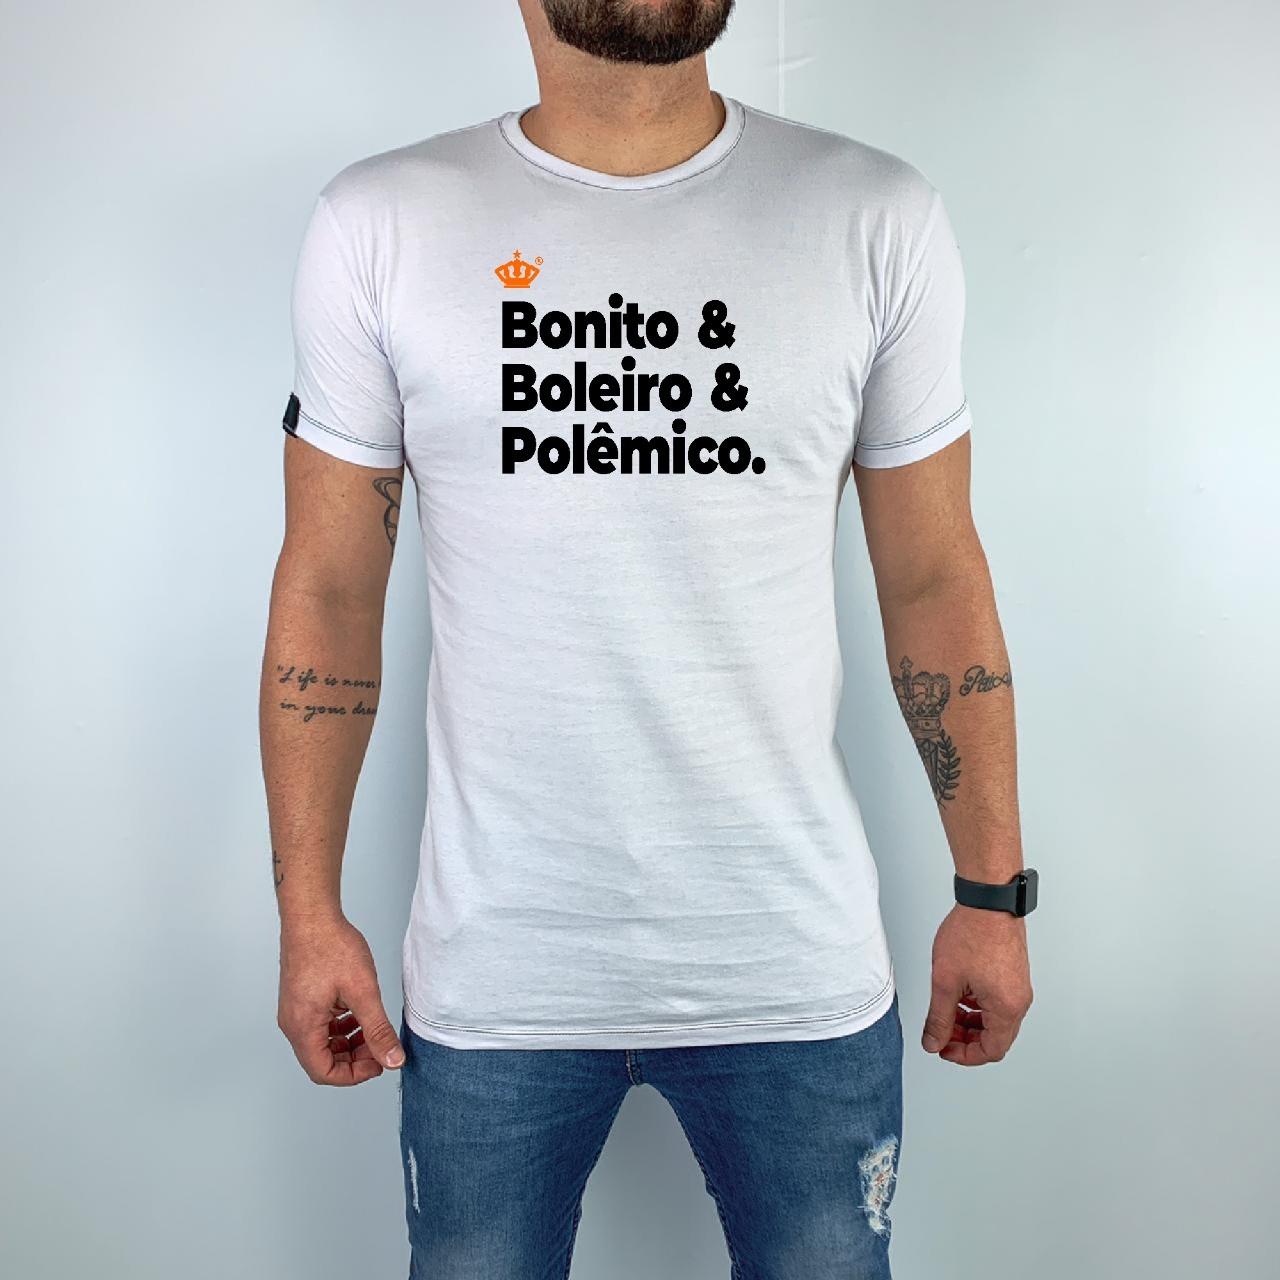 Camiseta Bonito & Boleiro & Polêmico